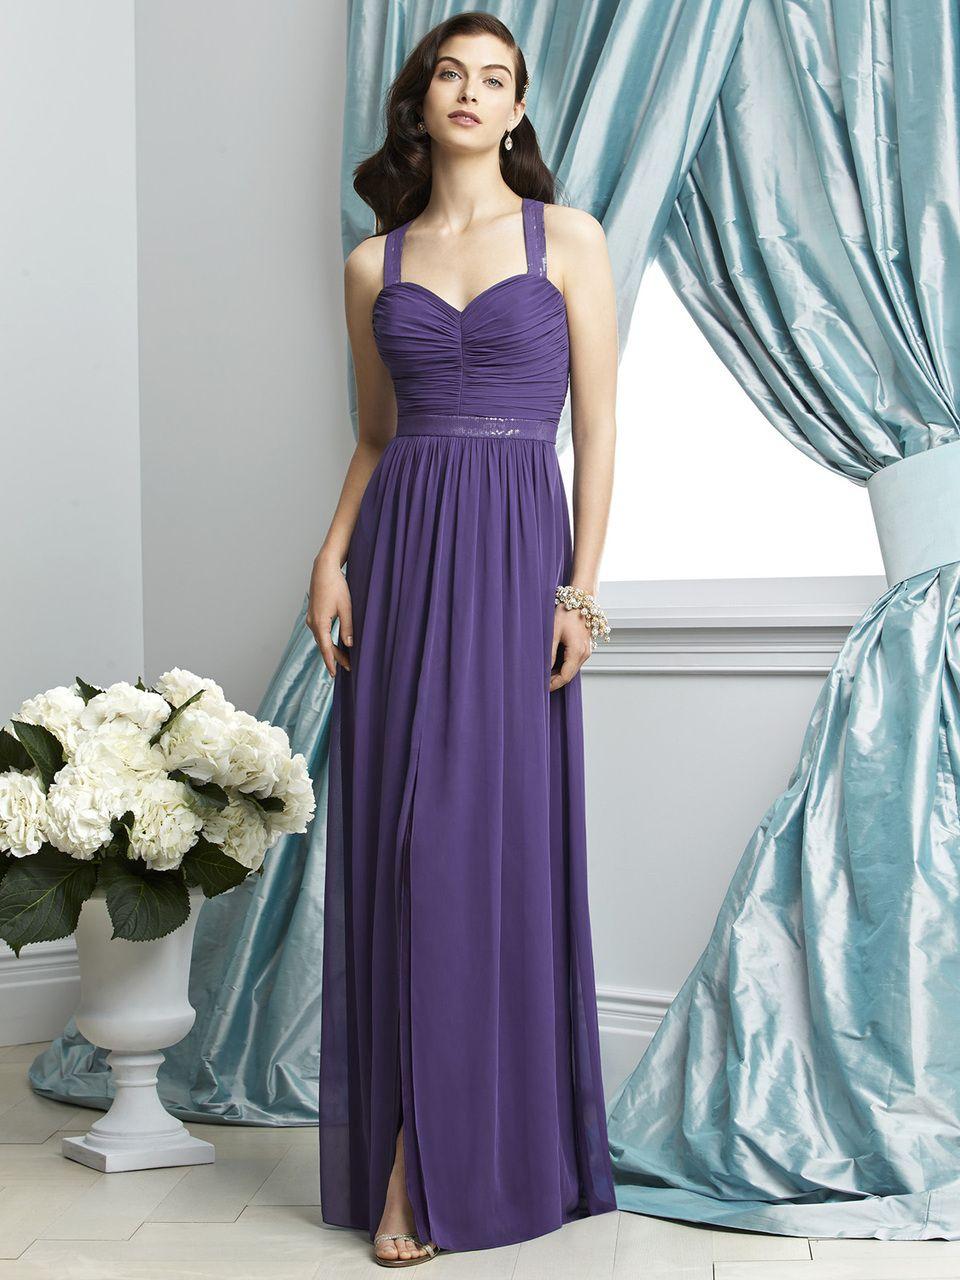 Dessy collection bridesmaid dress style blush bridal